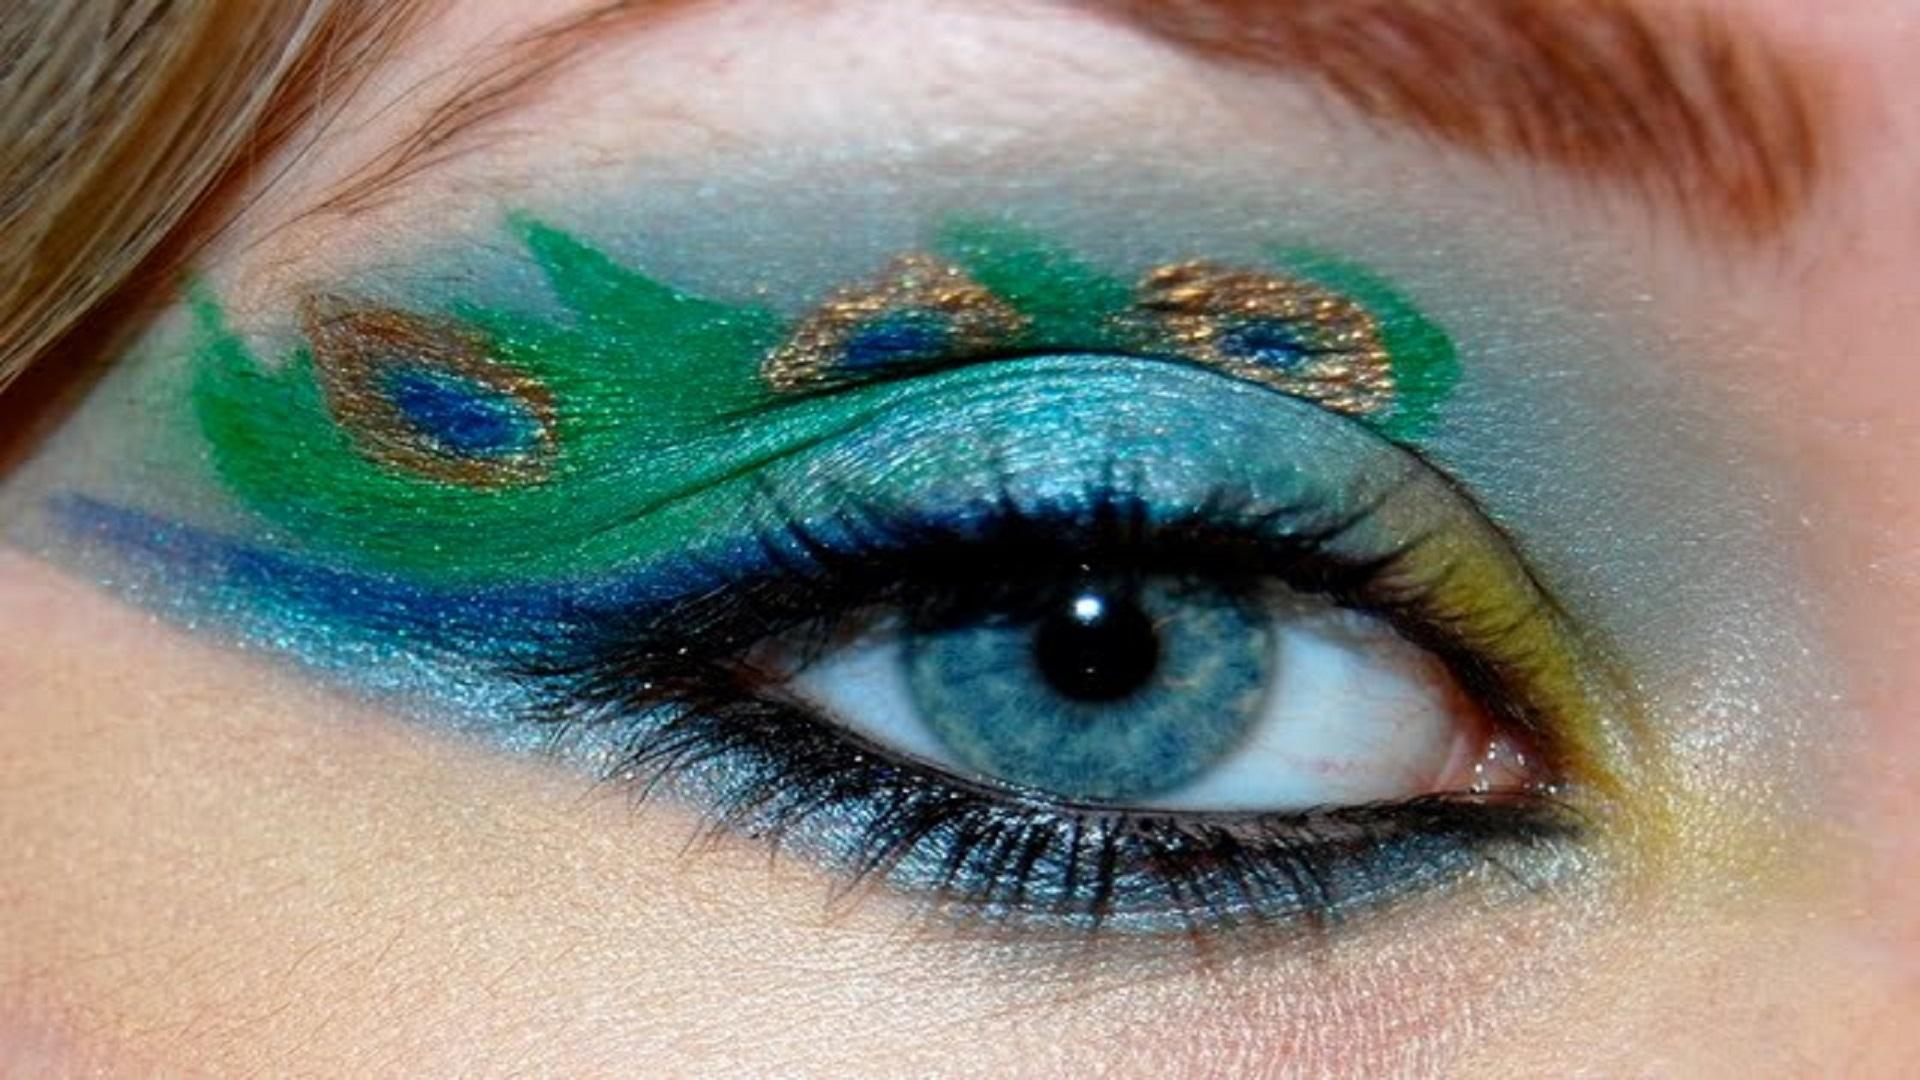 HOt-Midnight-Peacock-Eye-Makeup-free-wallpaper-hd